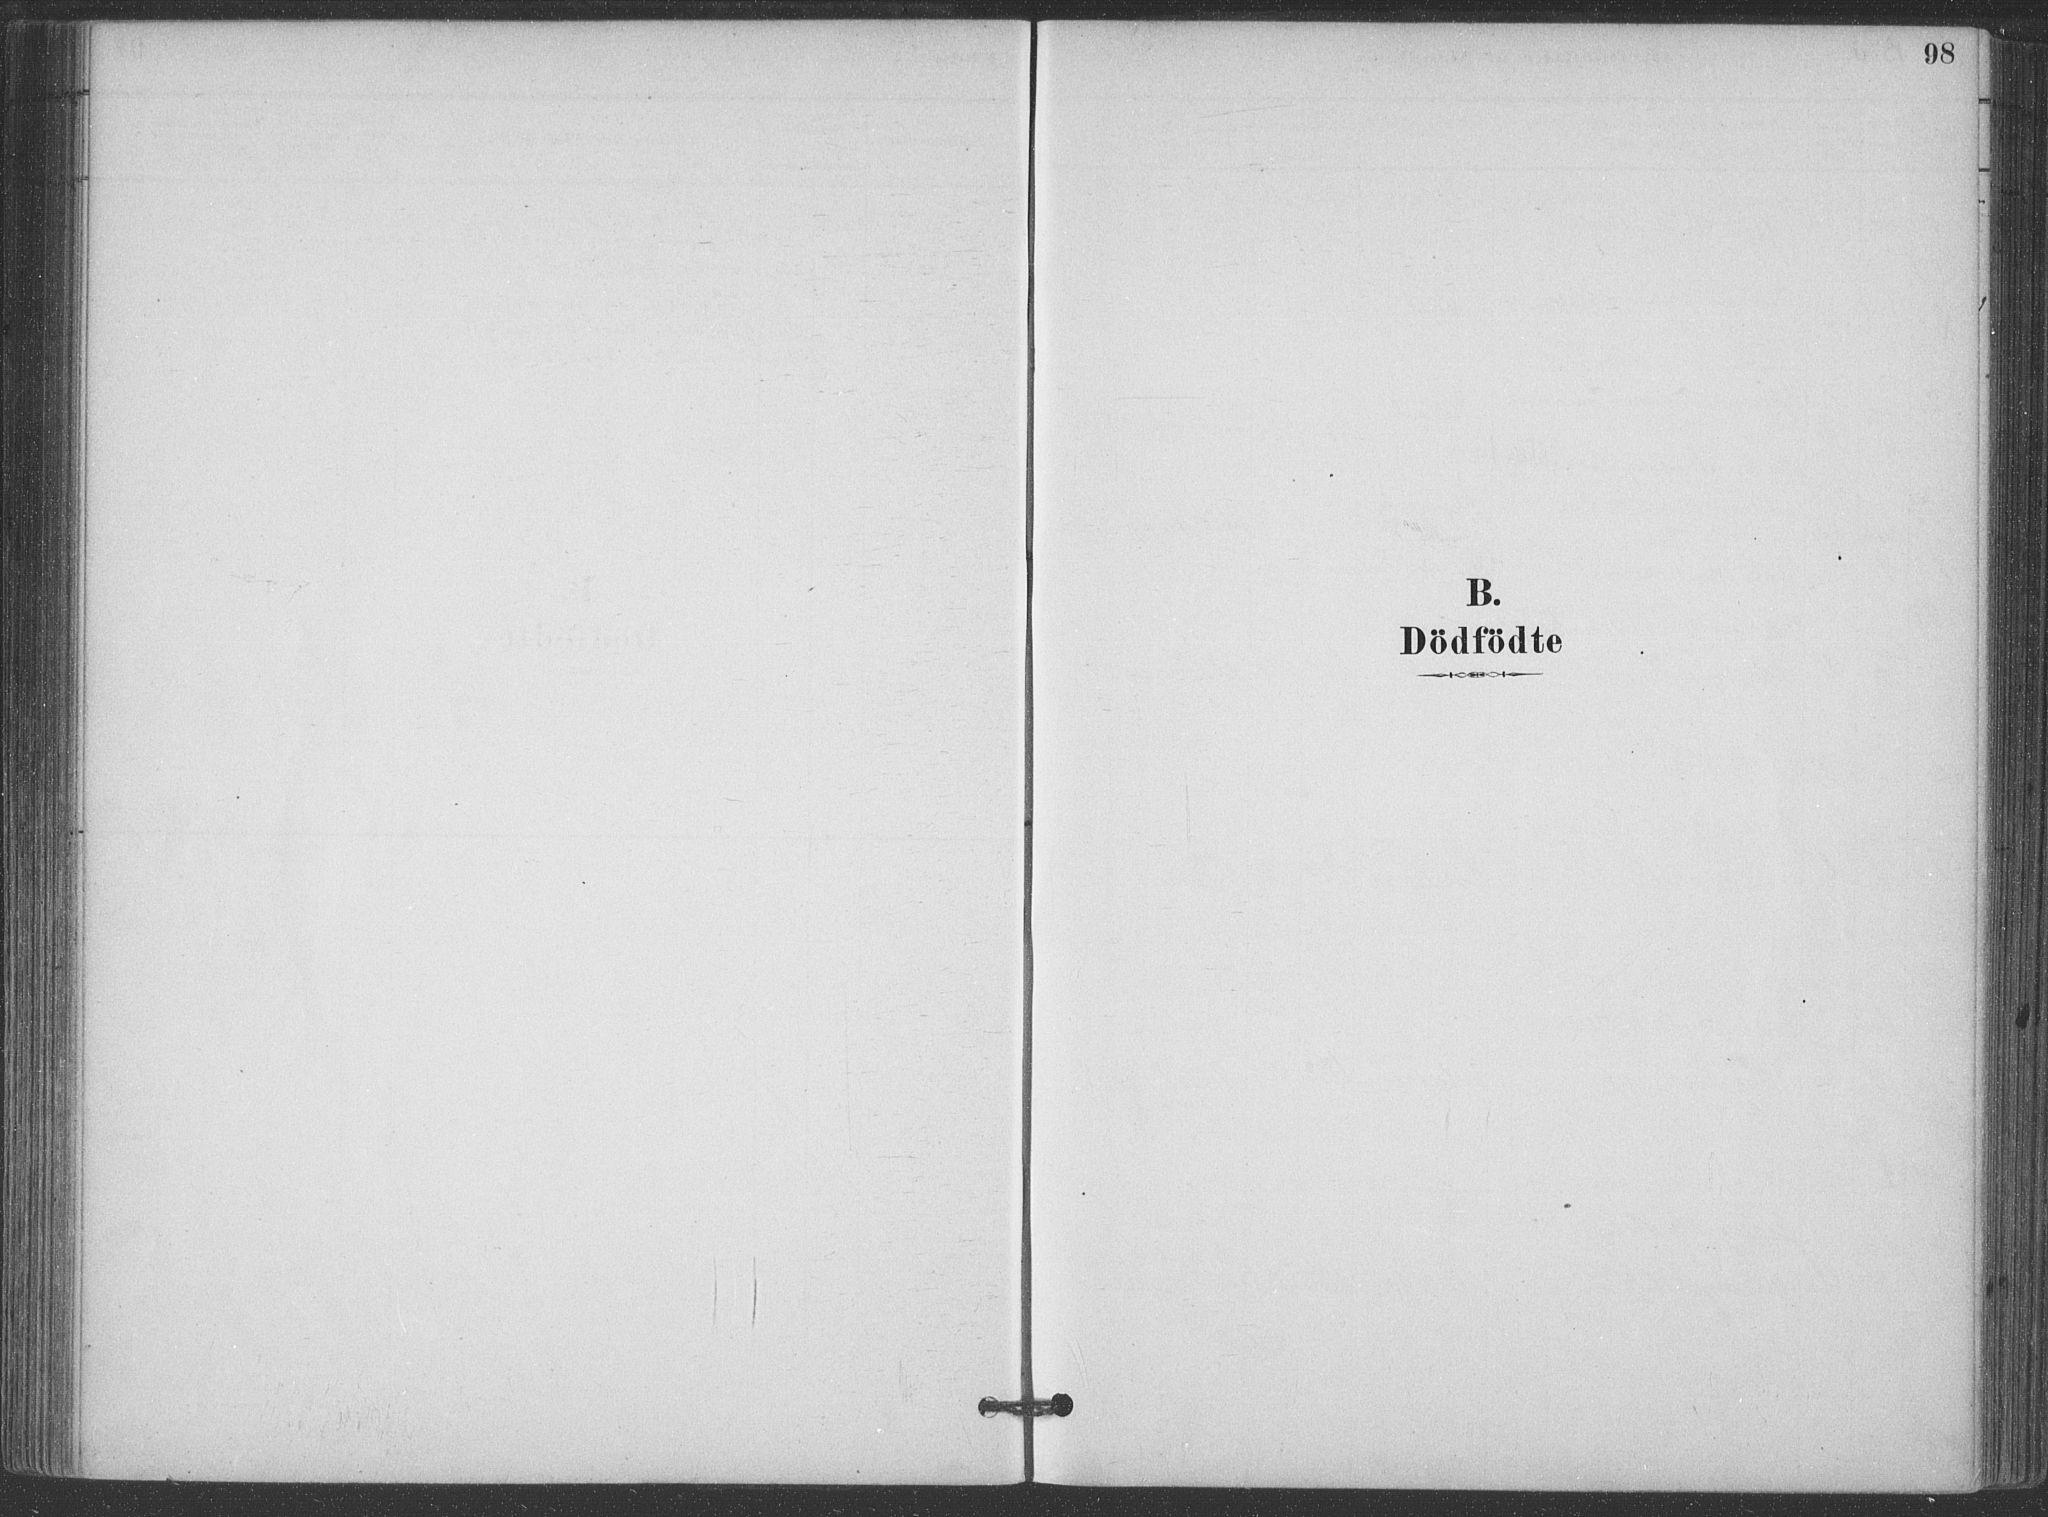 SAKO, Hjartdal kirkebøker, F/Fa/L0010: Ministerialbok nr. I 10, 1880-1929, s. 98